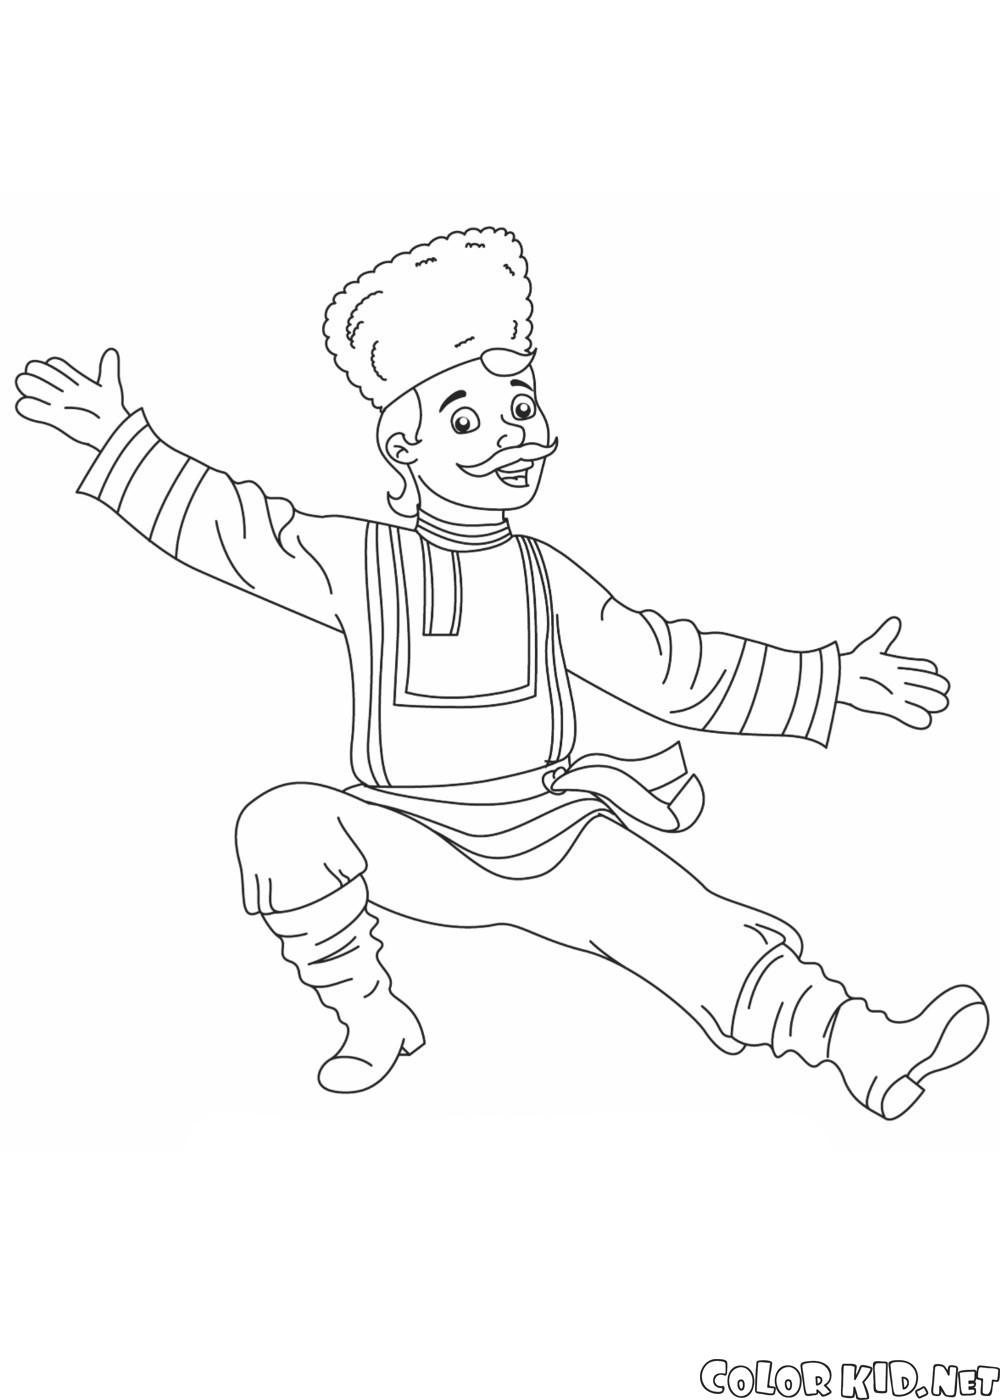 Ballerino russo